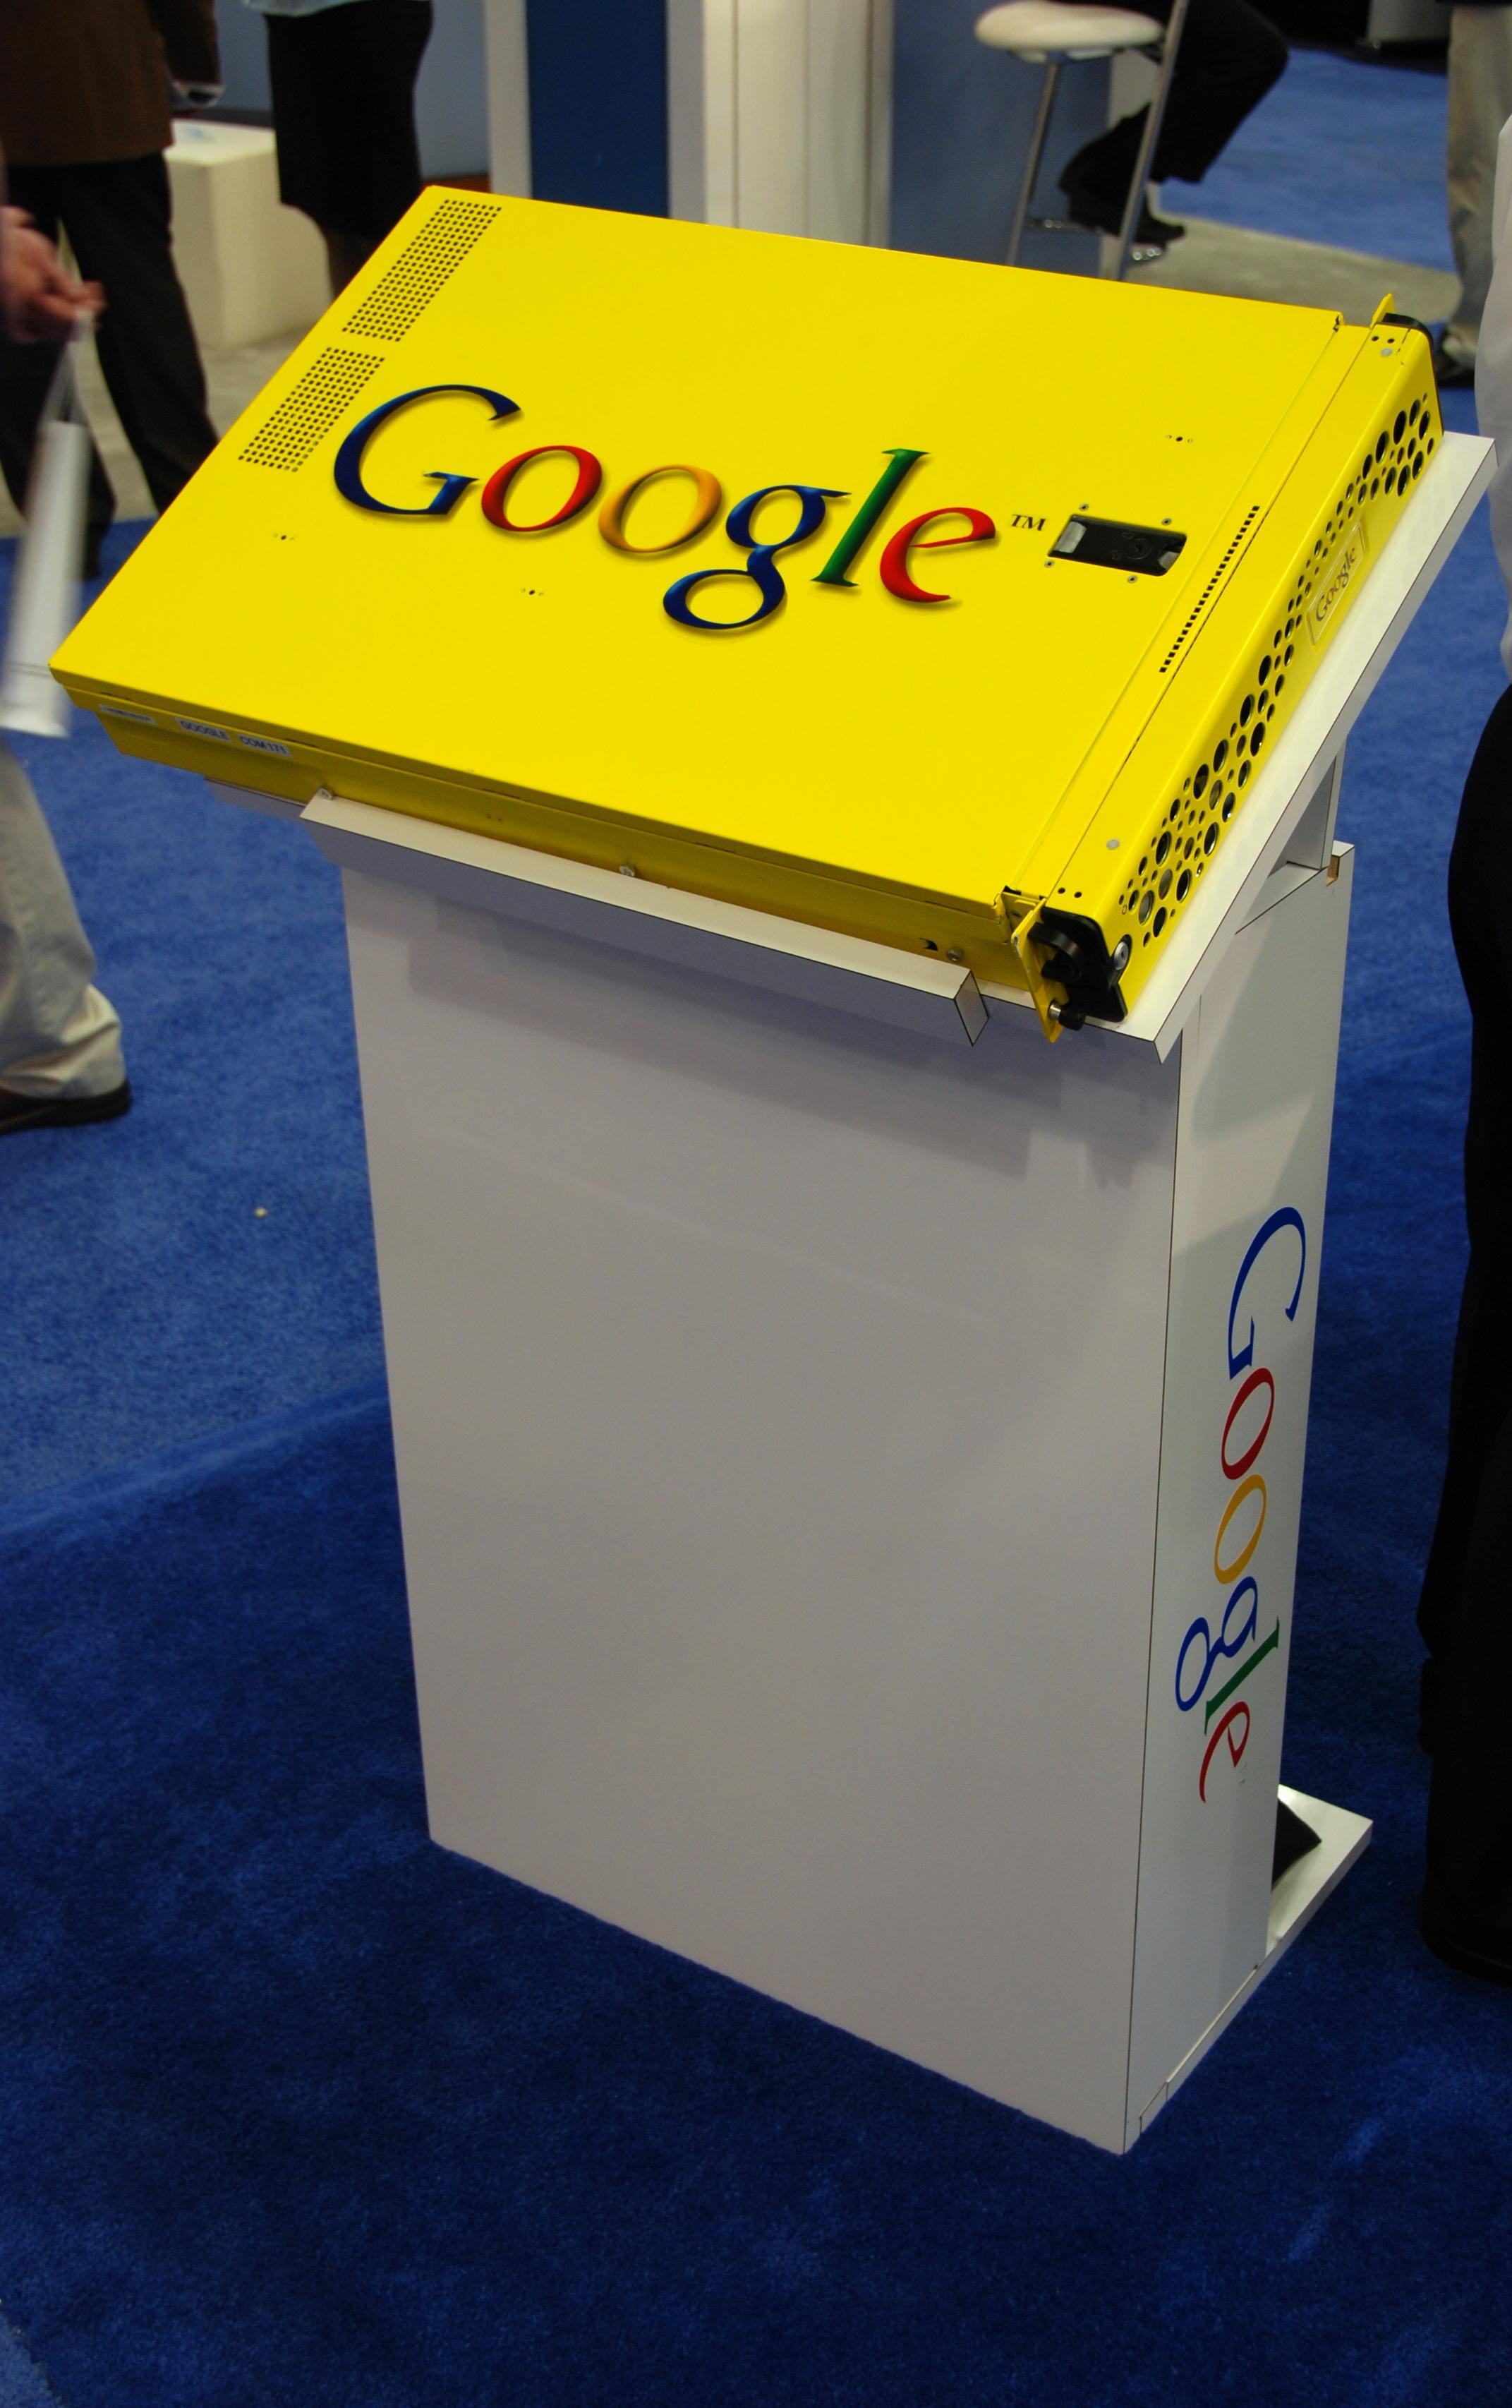 Google_Appliance.jpg